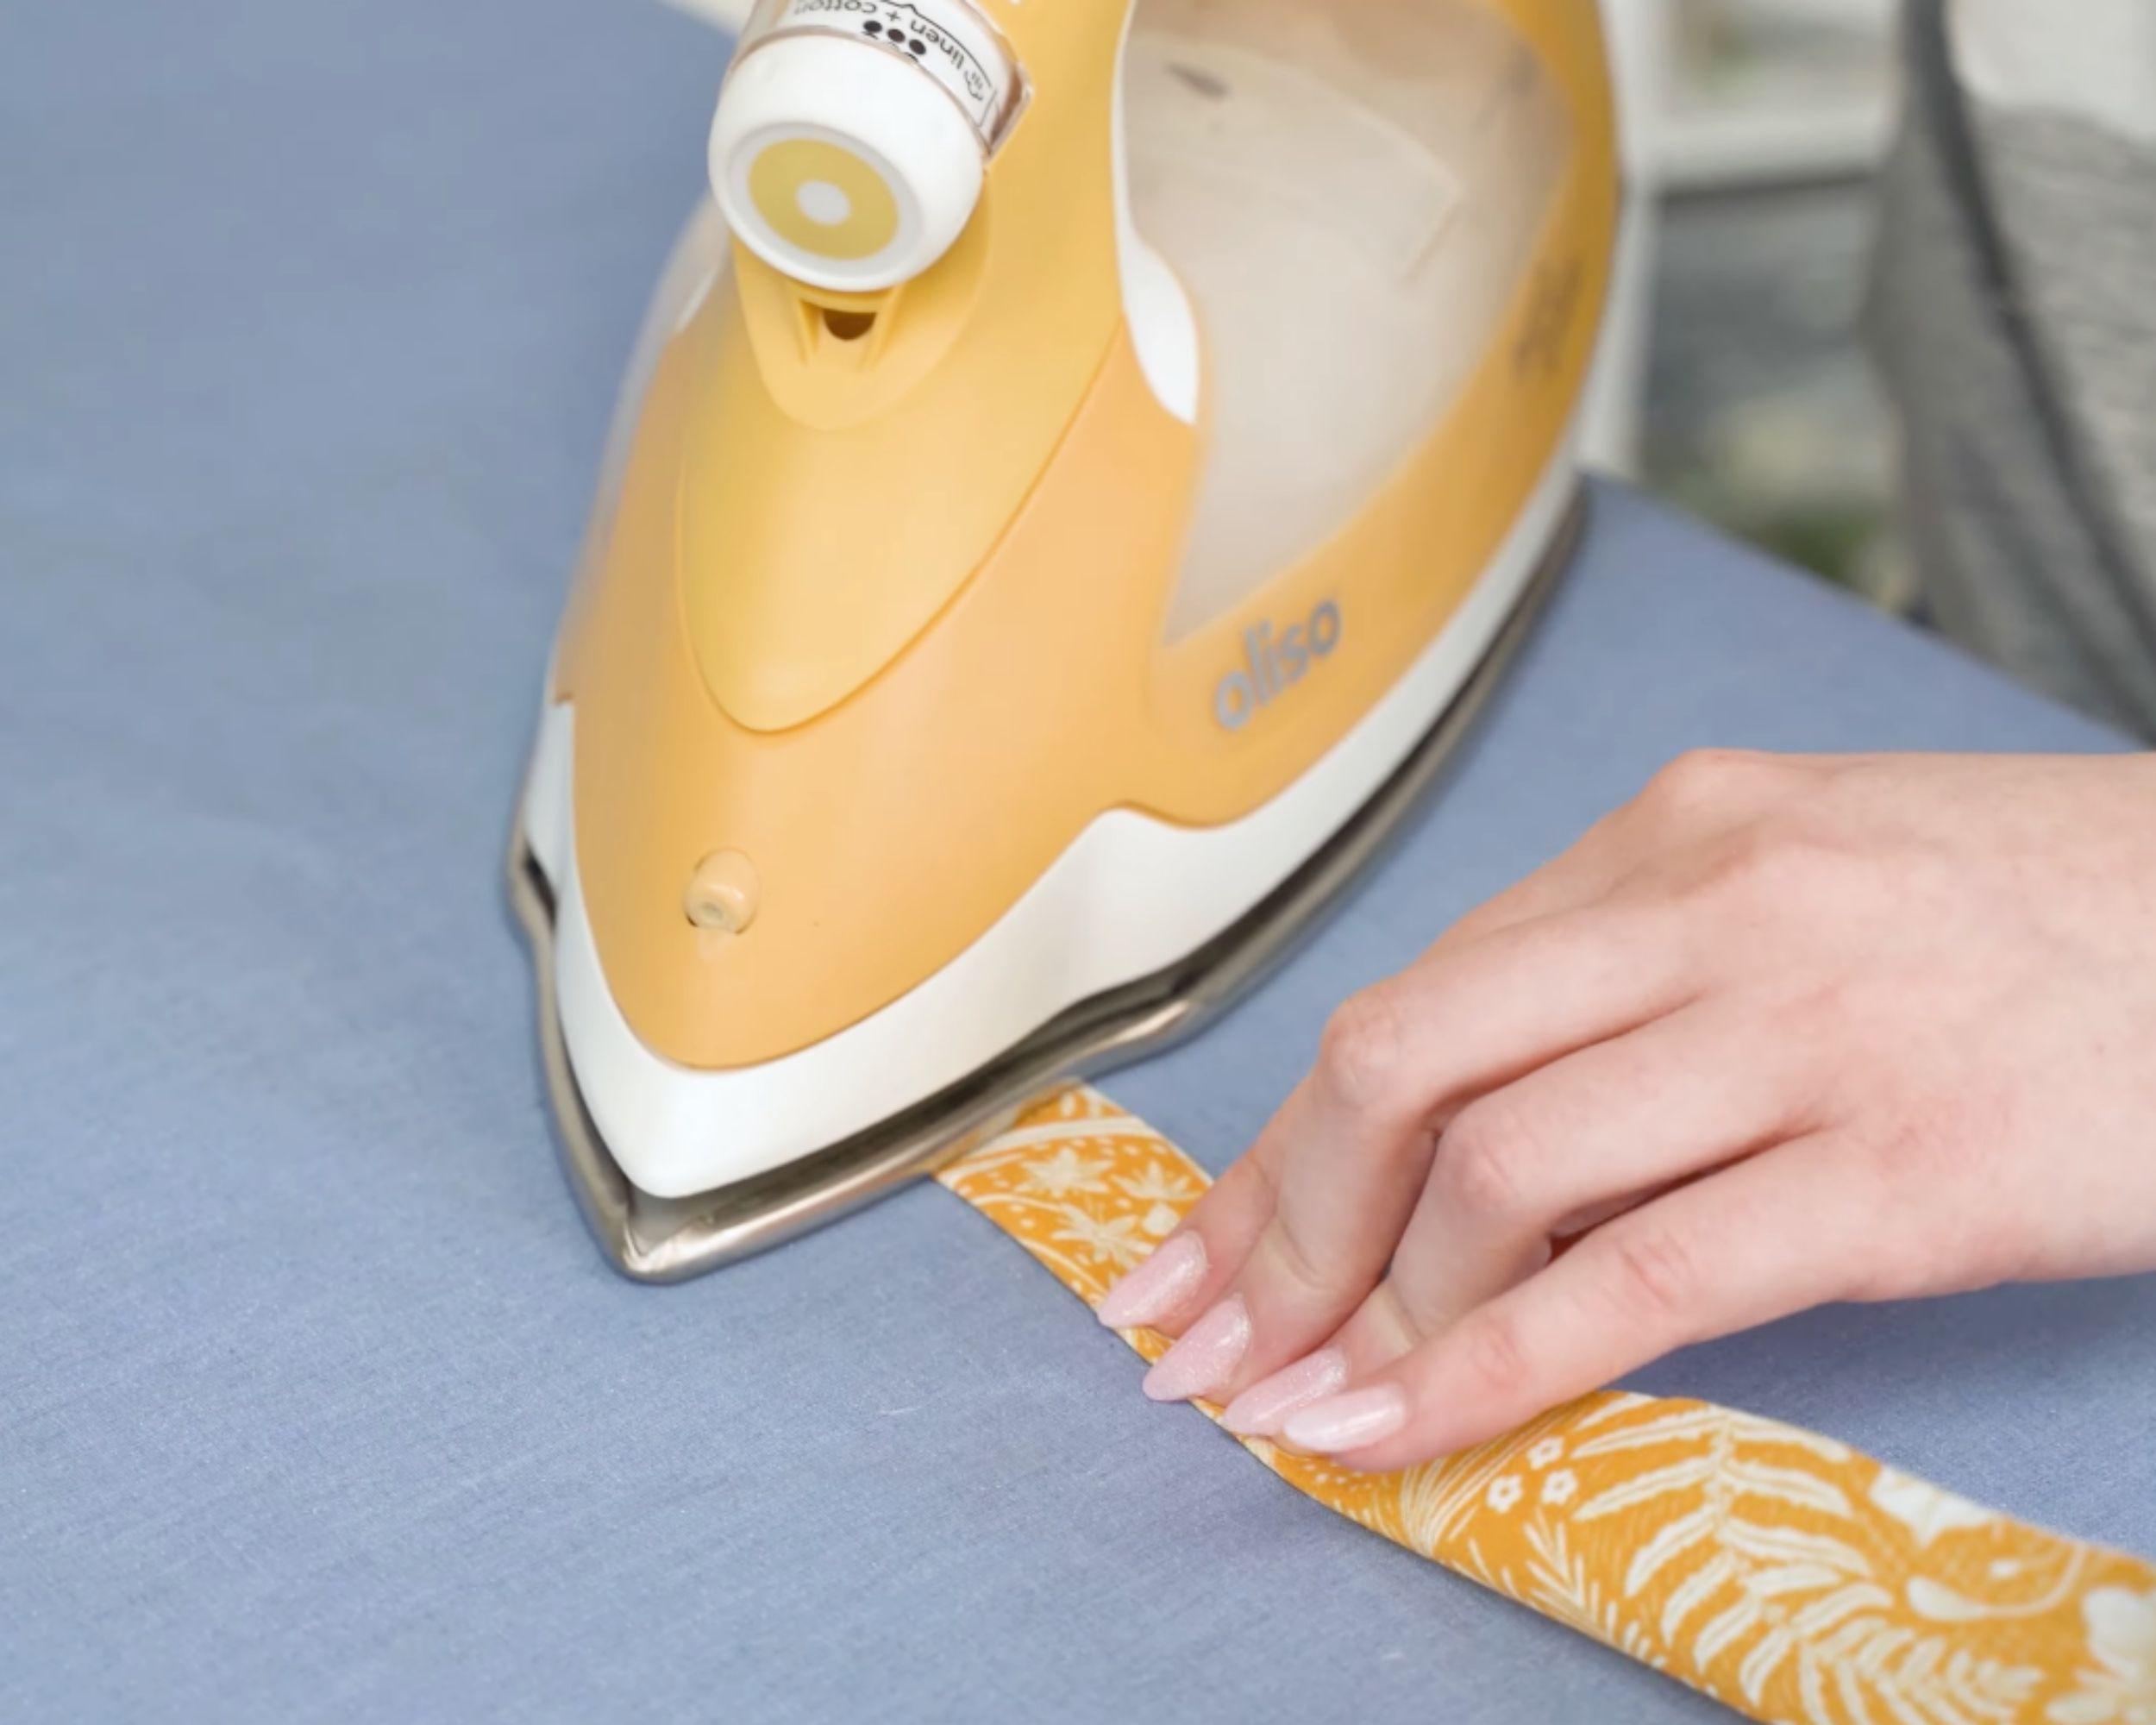 Ironing the placket fabric